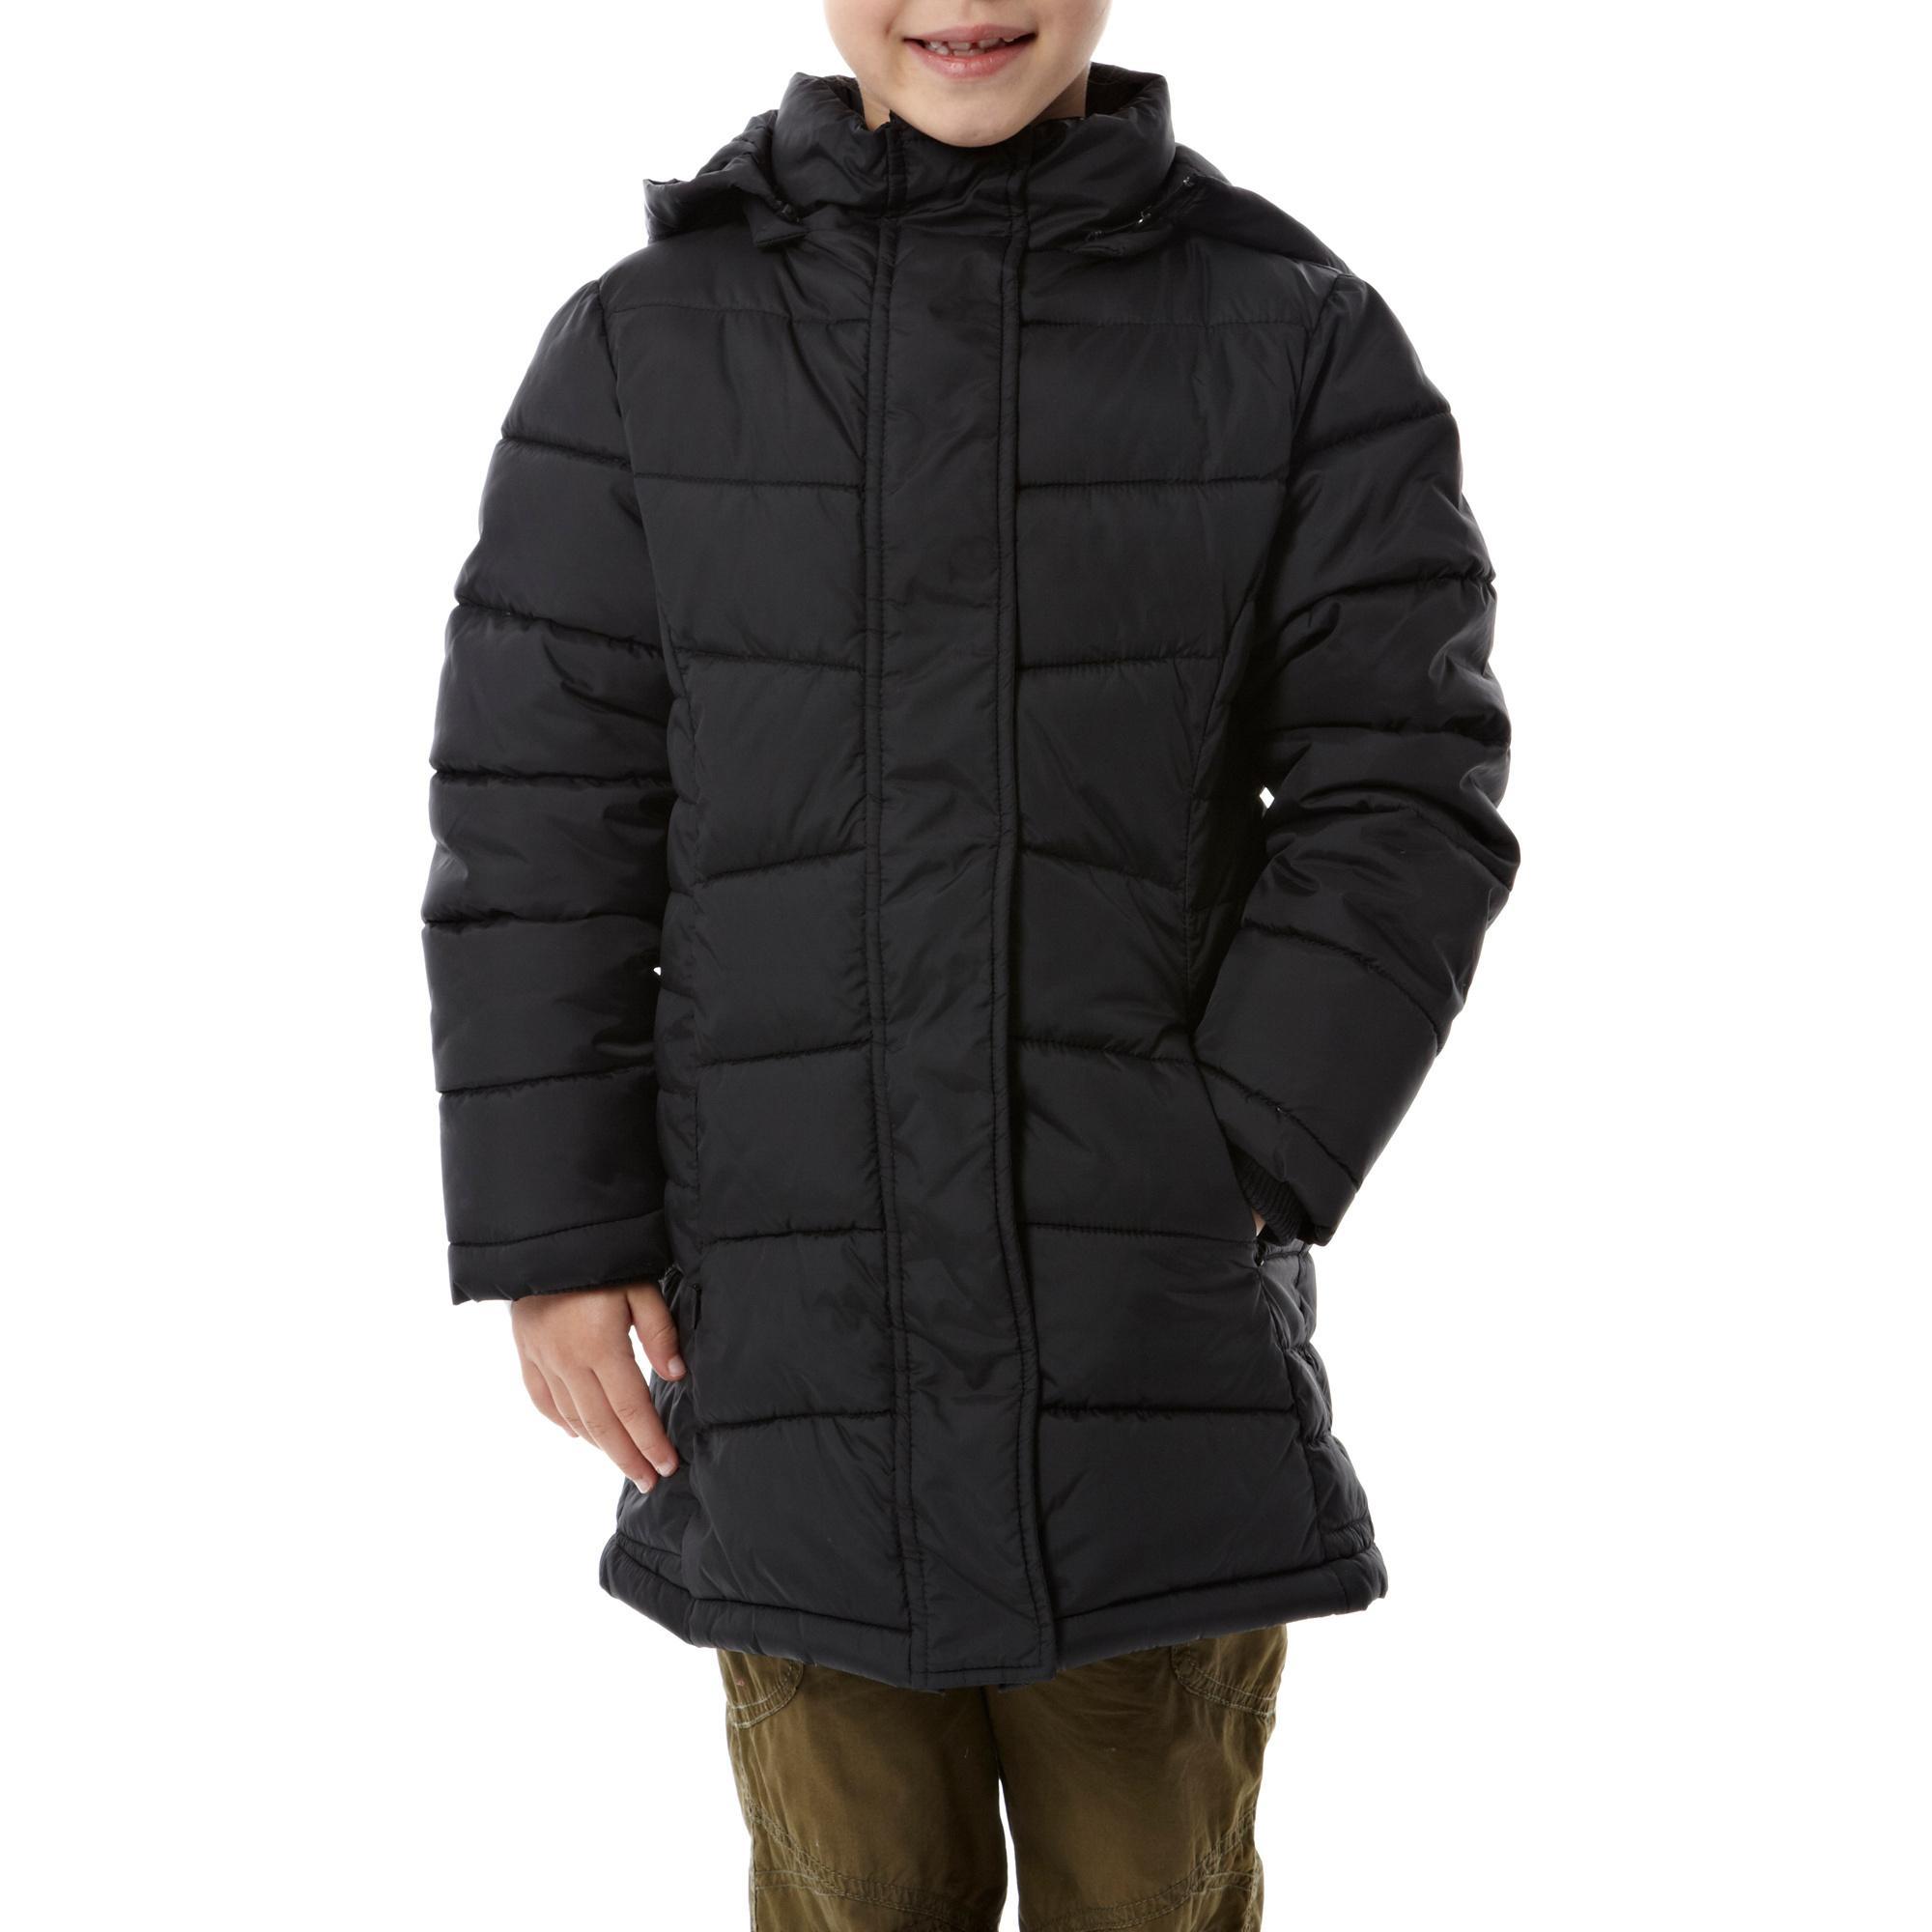 Peter Storm Girls Longline Straight Baffle Jacket Black